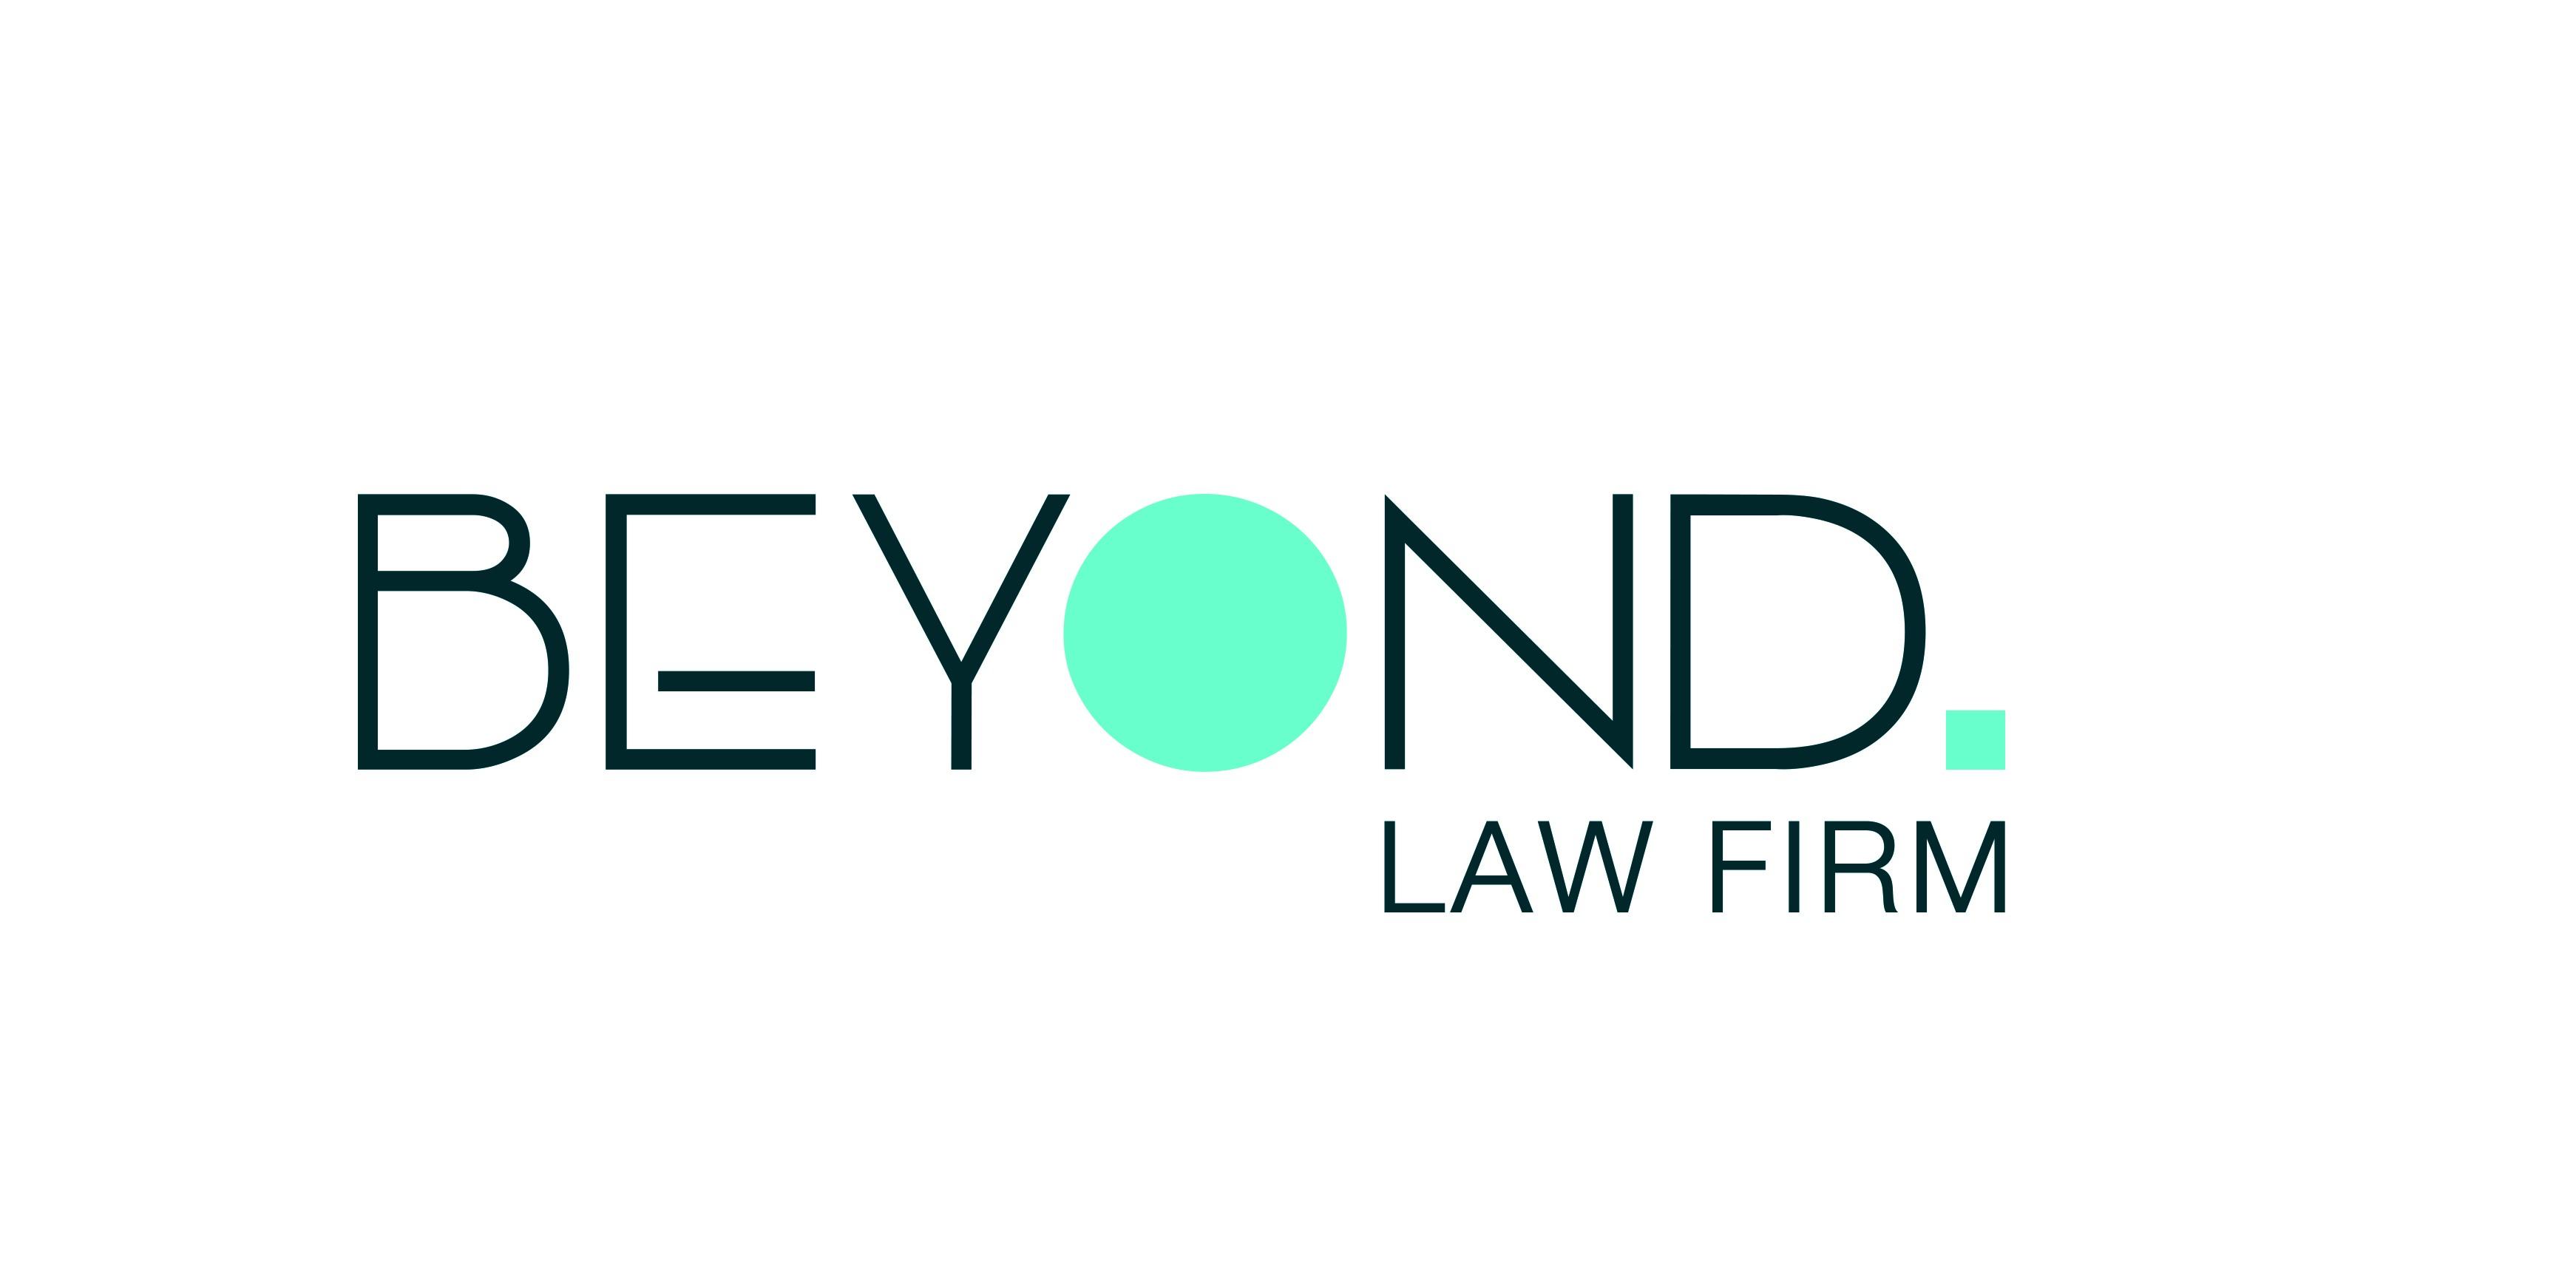 Beyond Lawfirm